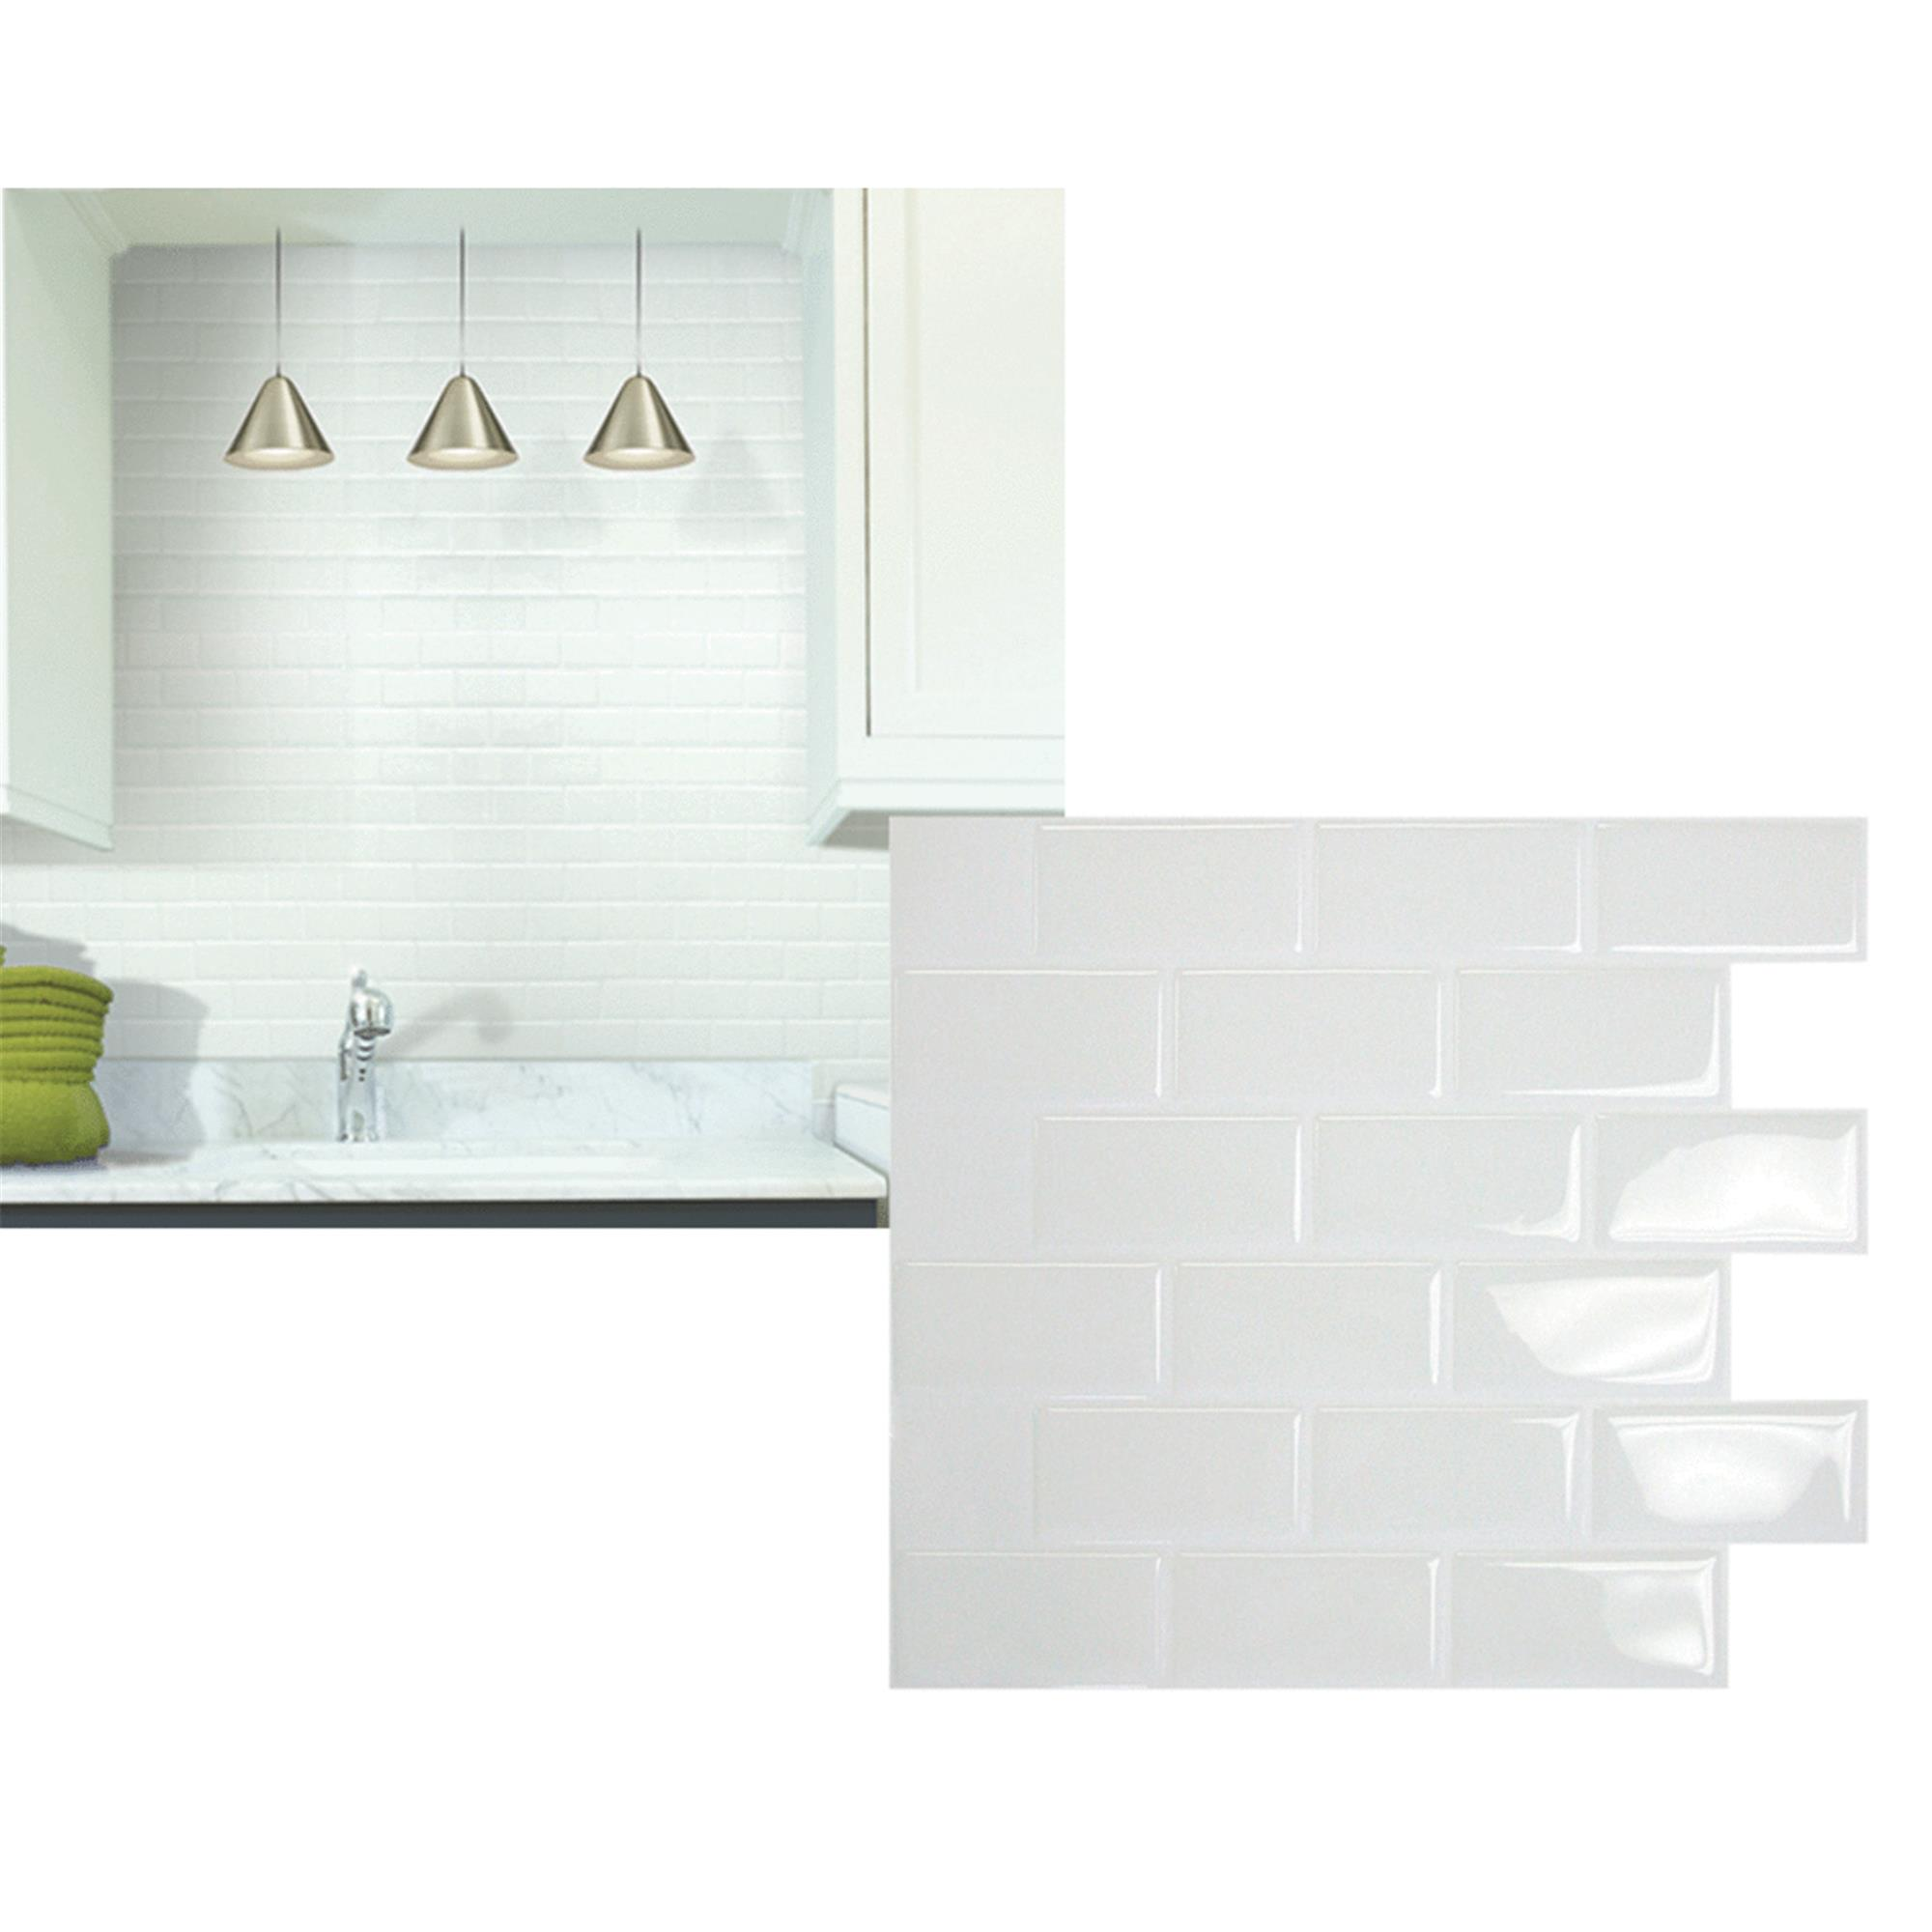 Smart Tiles Original Peel & Stick Backsplash Wall Tile